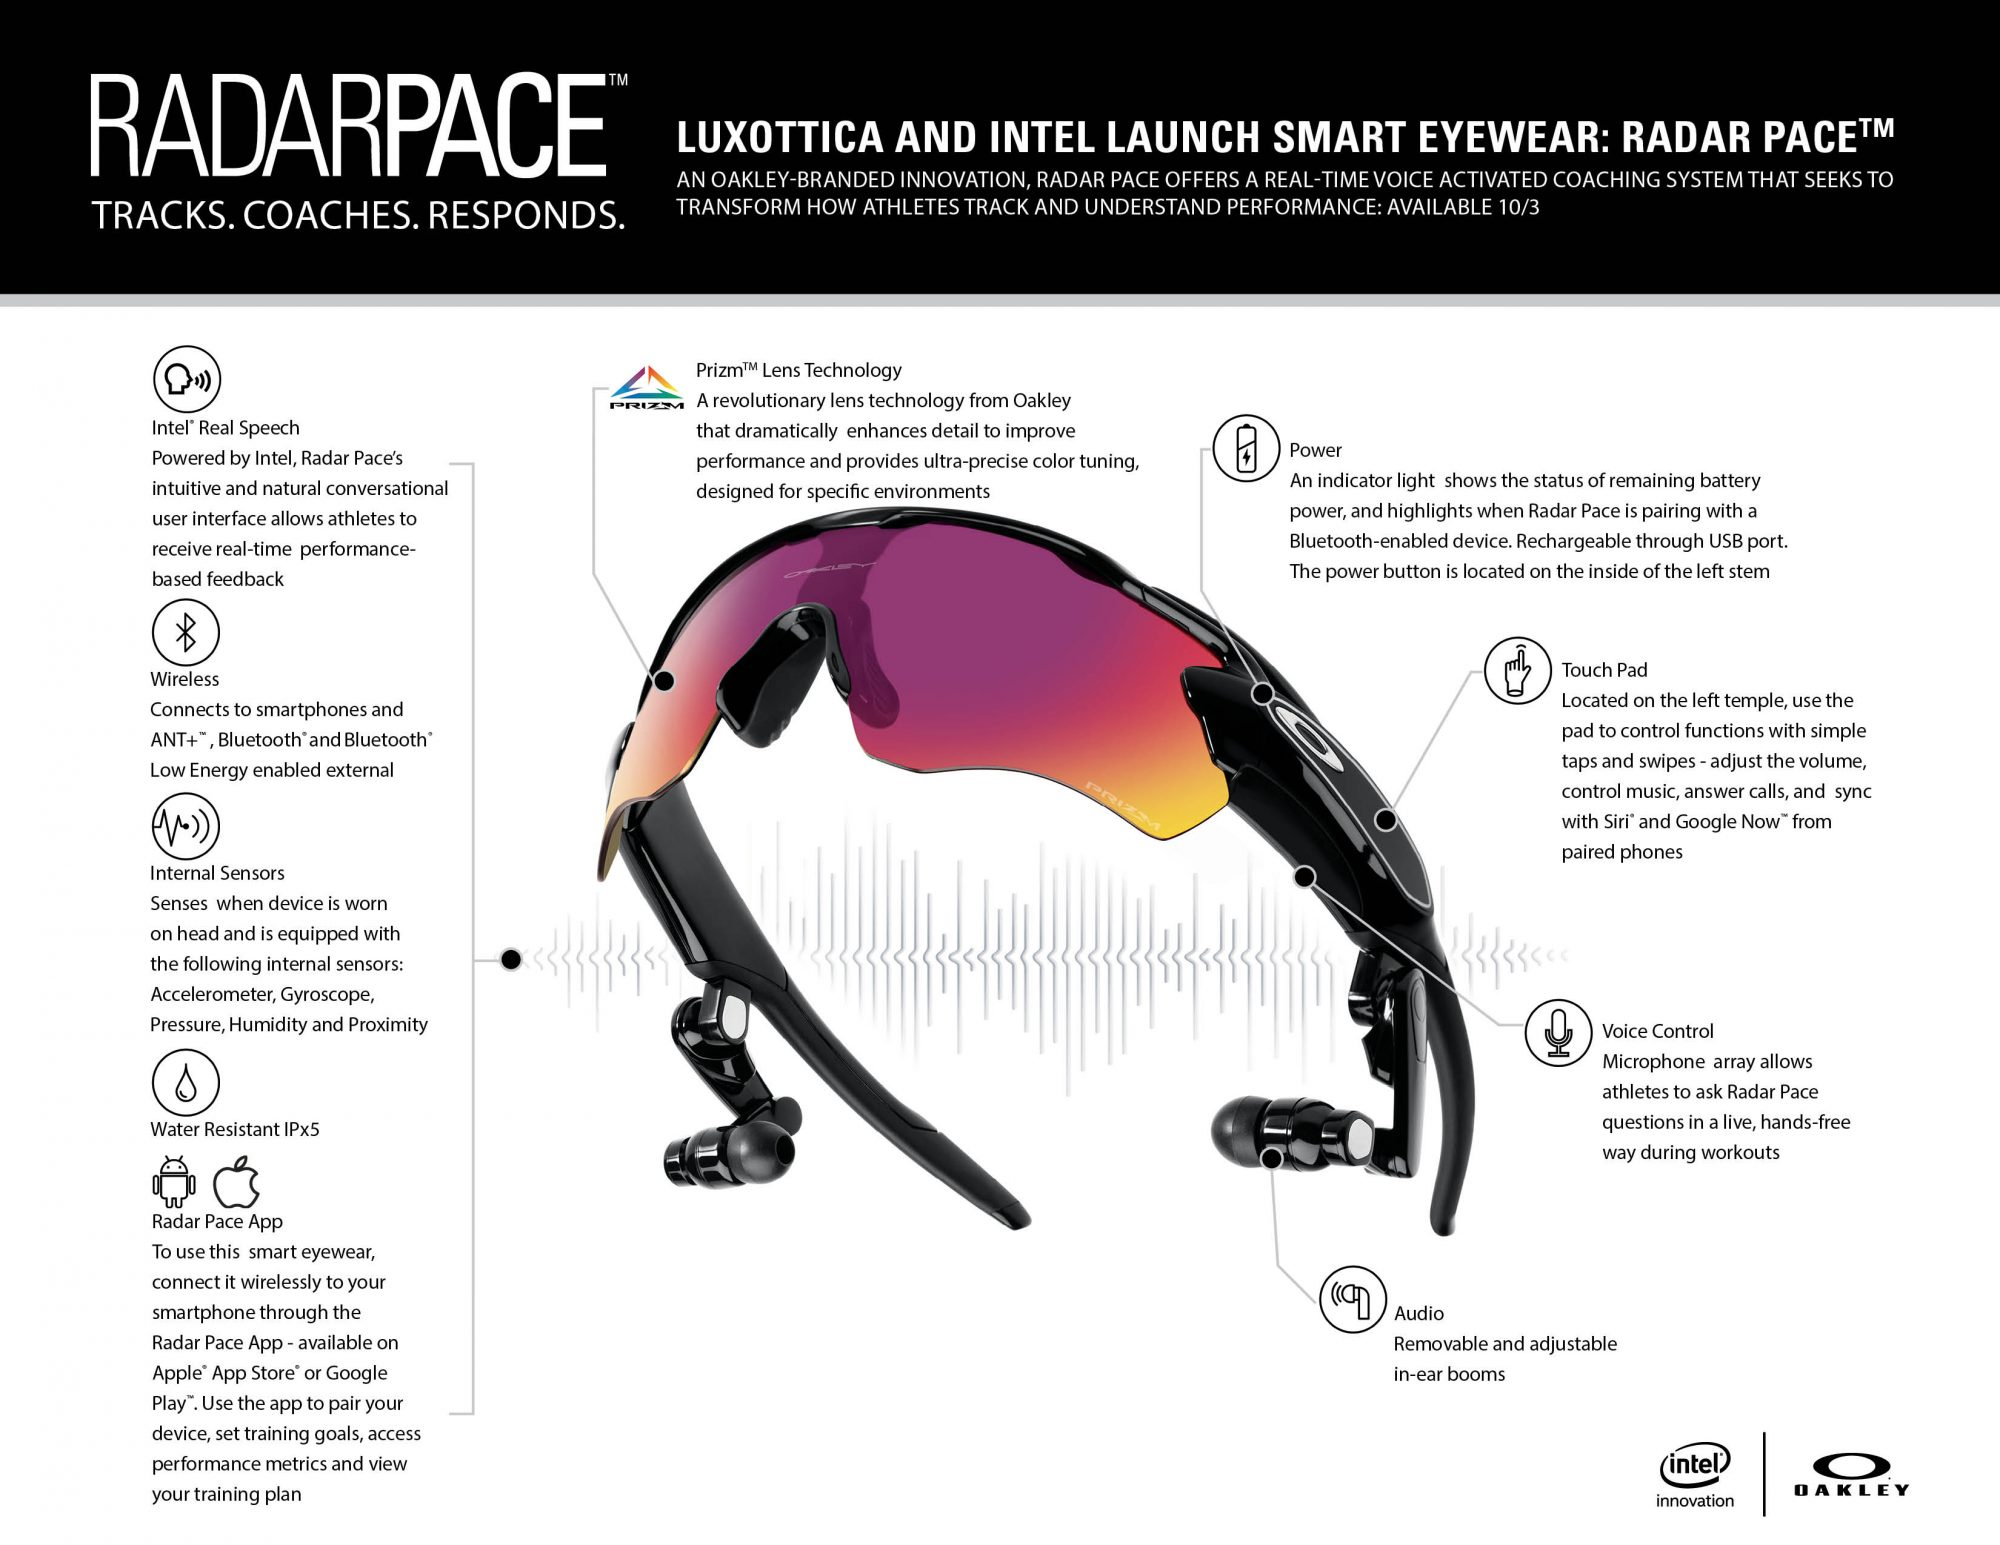 oakley_radar-pace_tech-sheet_english